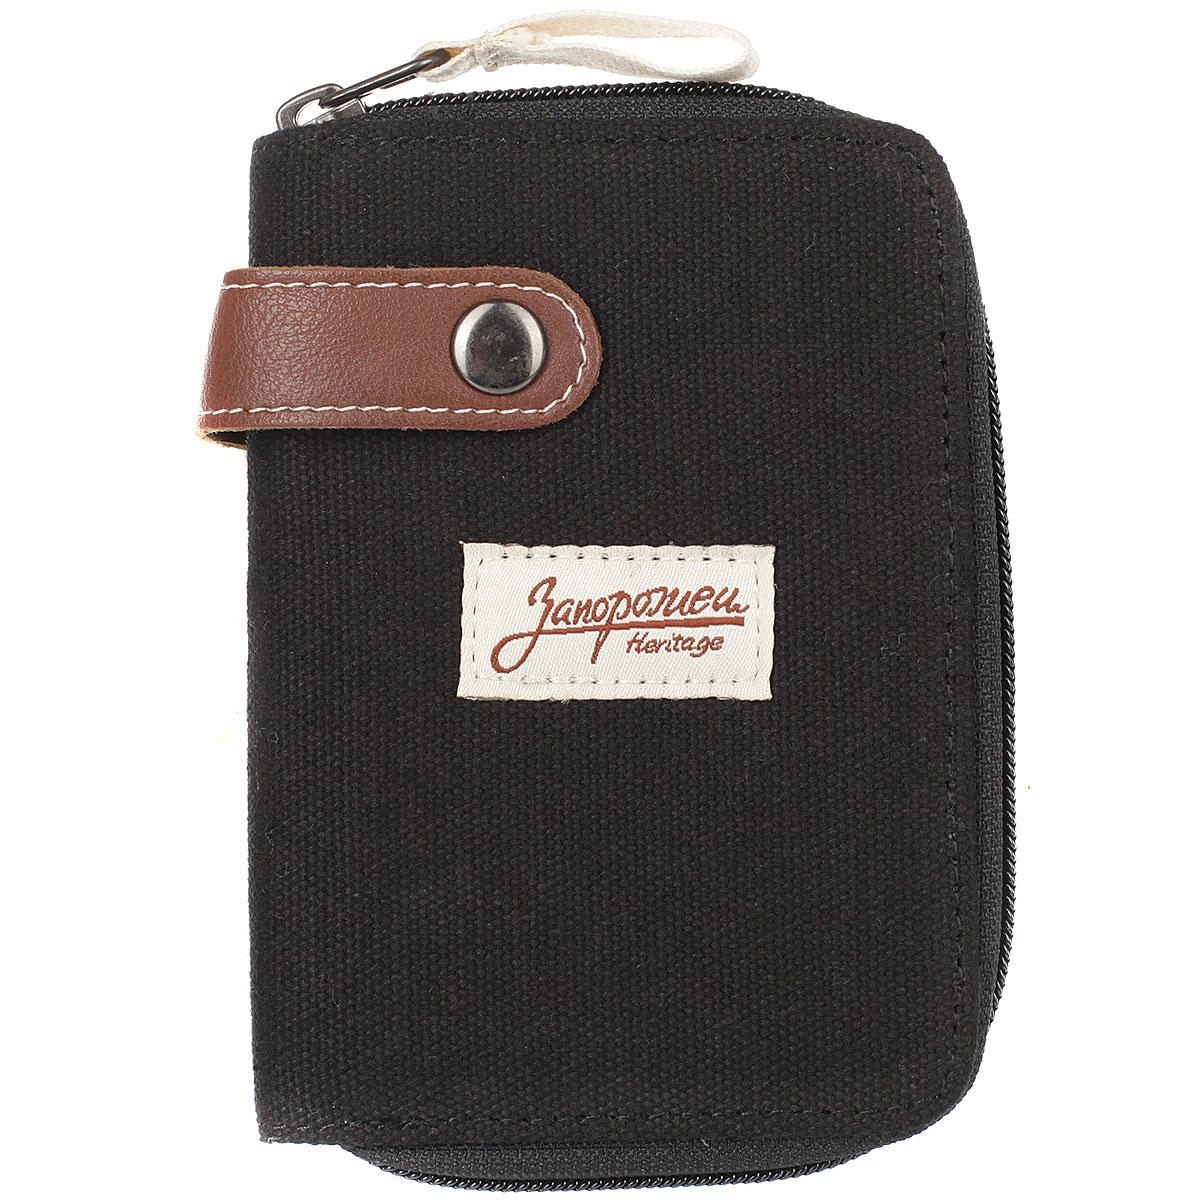 e339f1a1bbbc Купить кошелек запорожец Zip Wallet Black/Brown в интернет-магазине ...